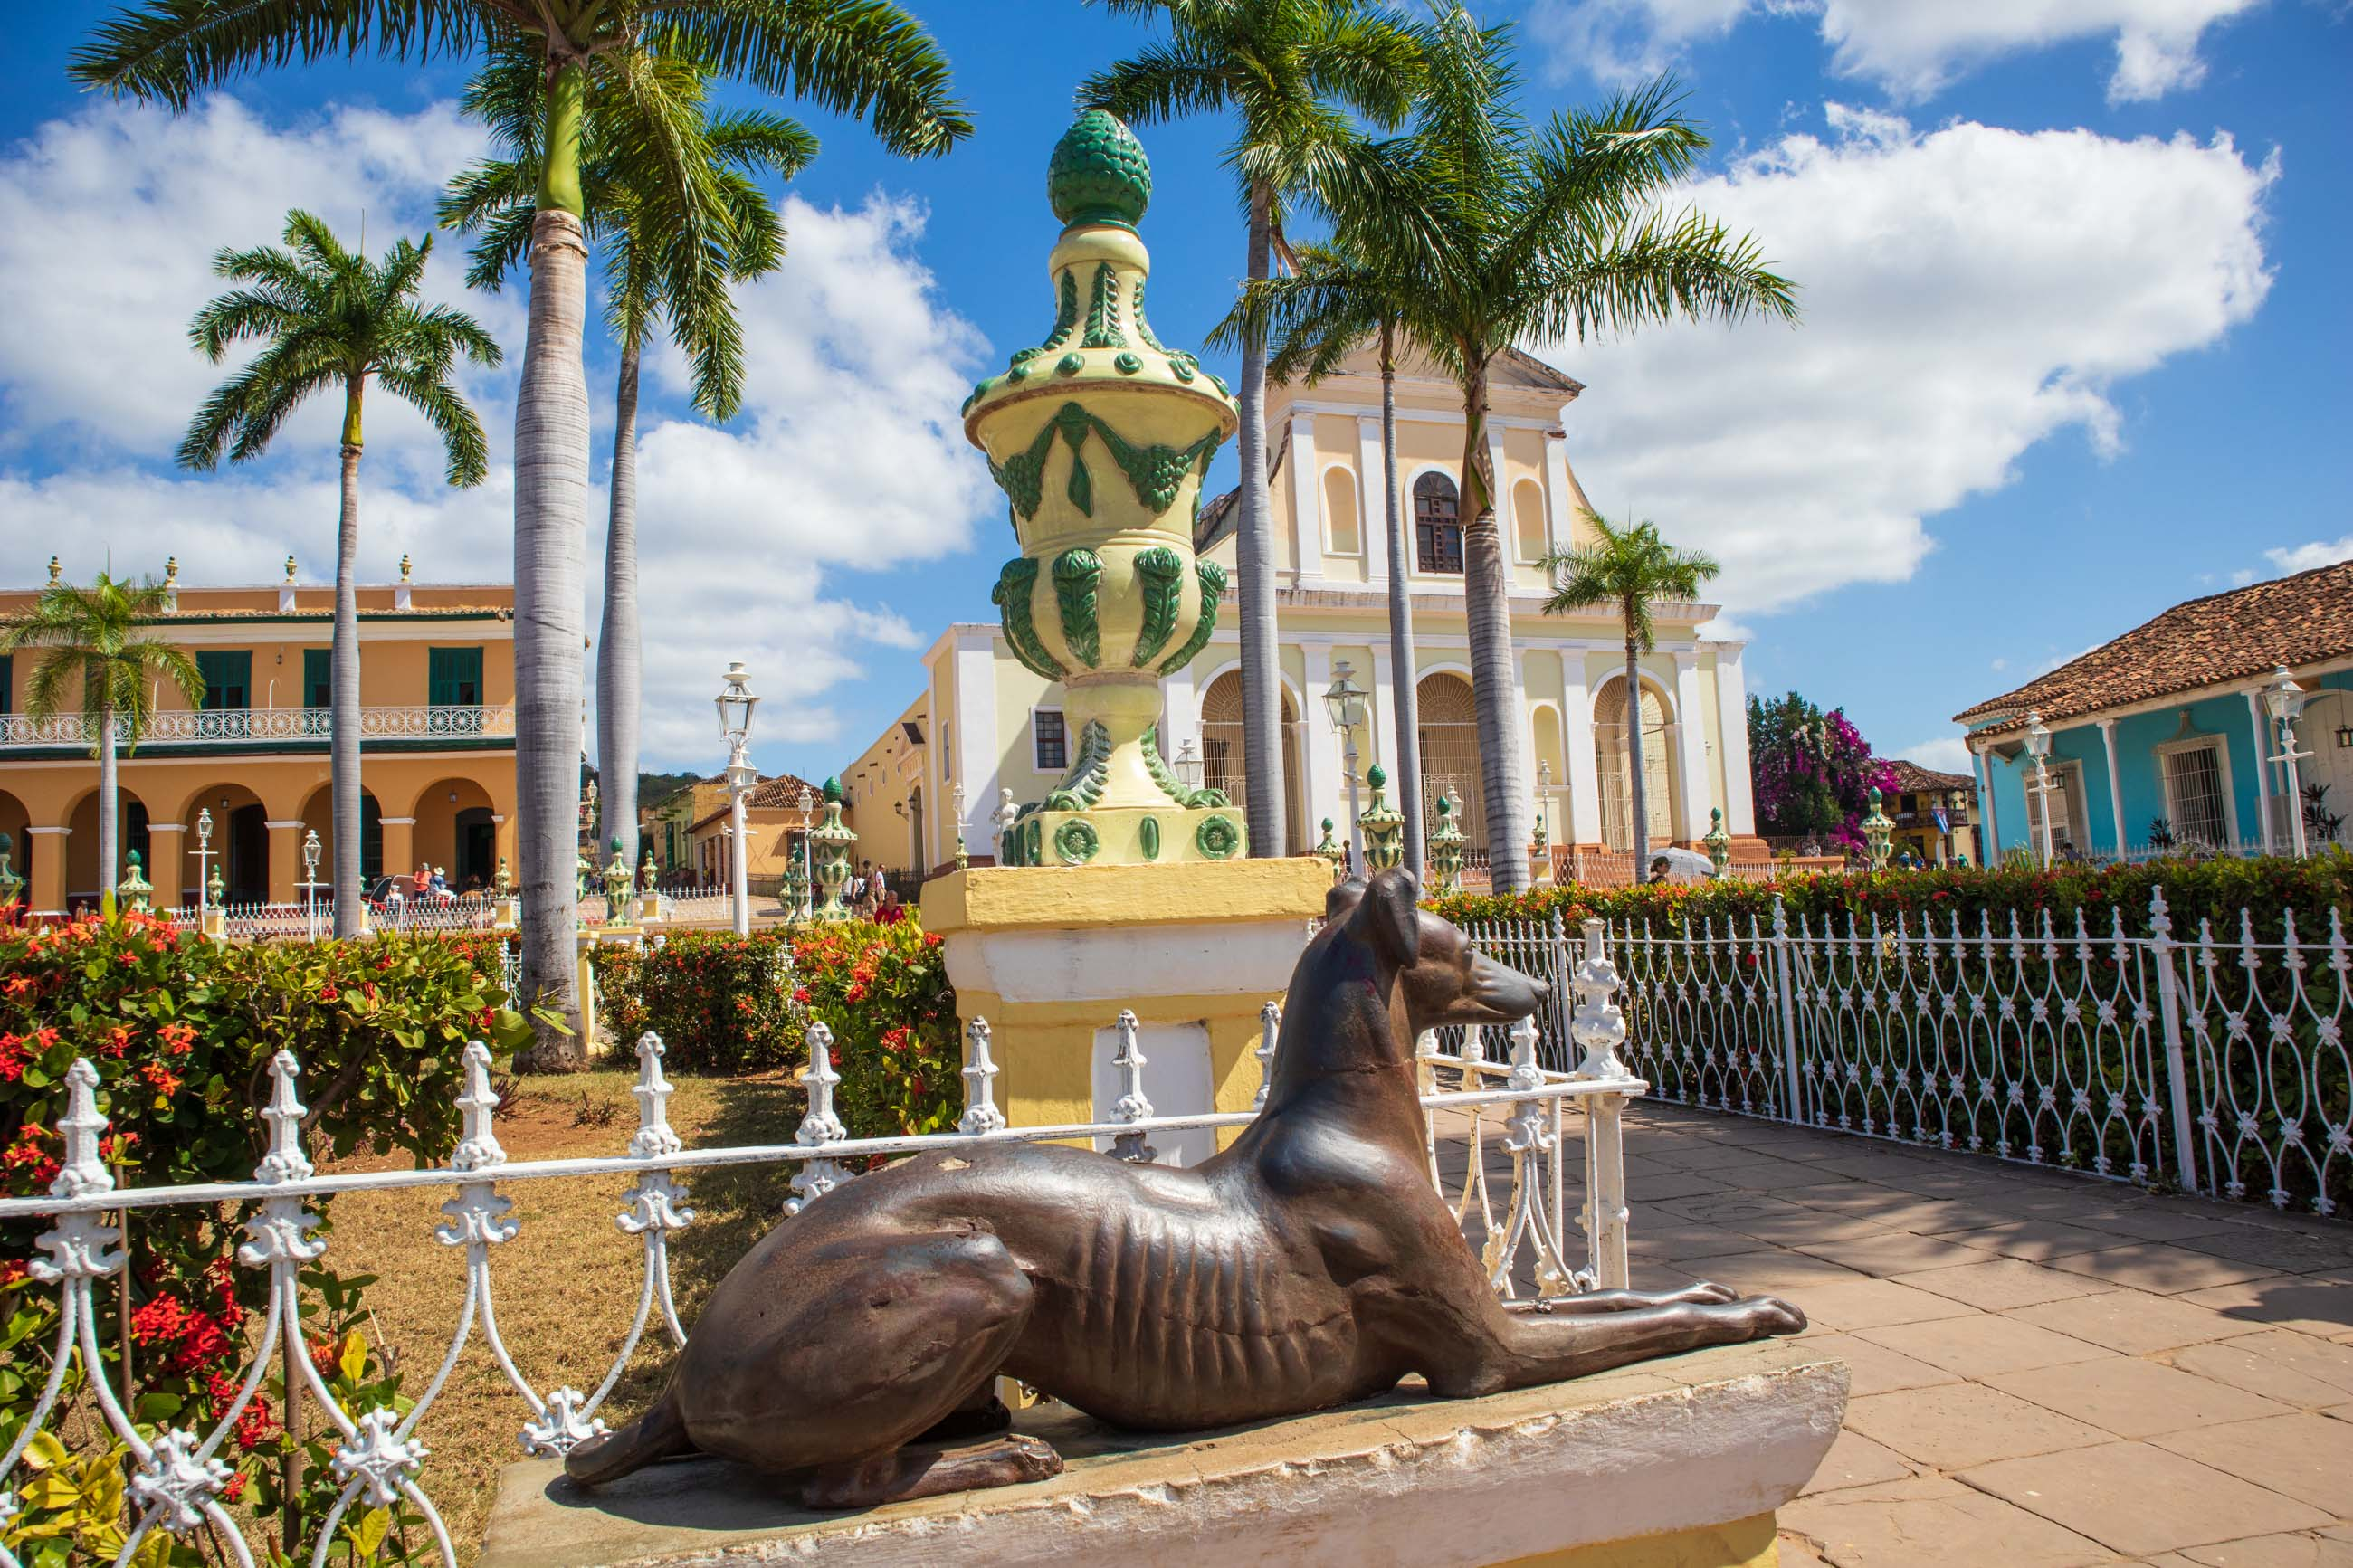 https://bubo.sk/uploads/galleries/5009/luborkucera_kuba_trinidad_img_0286.jpg